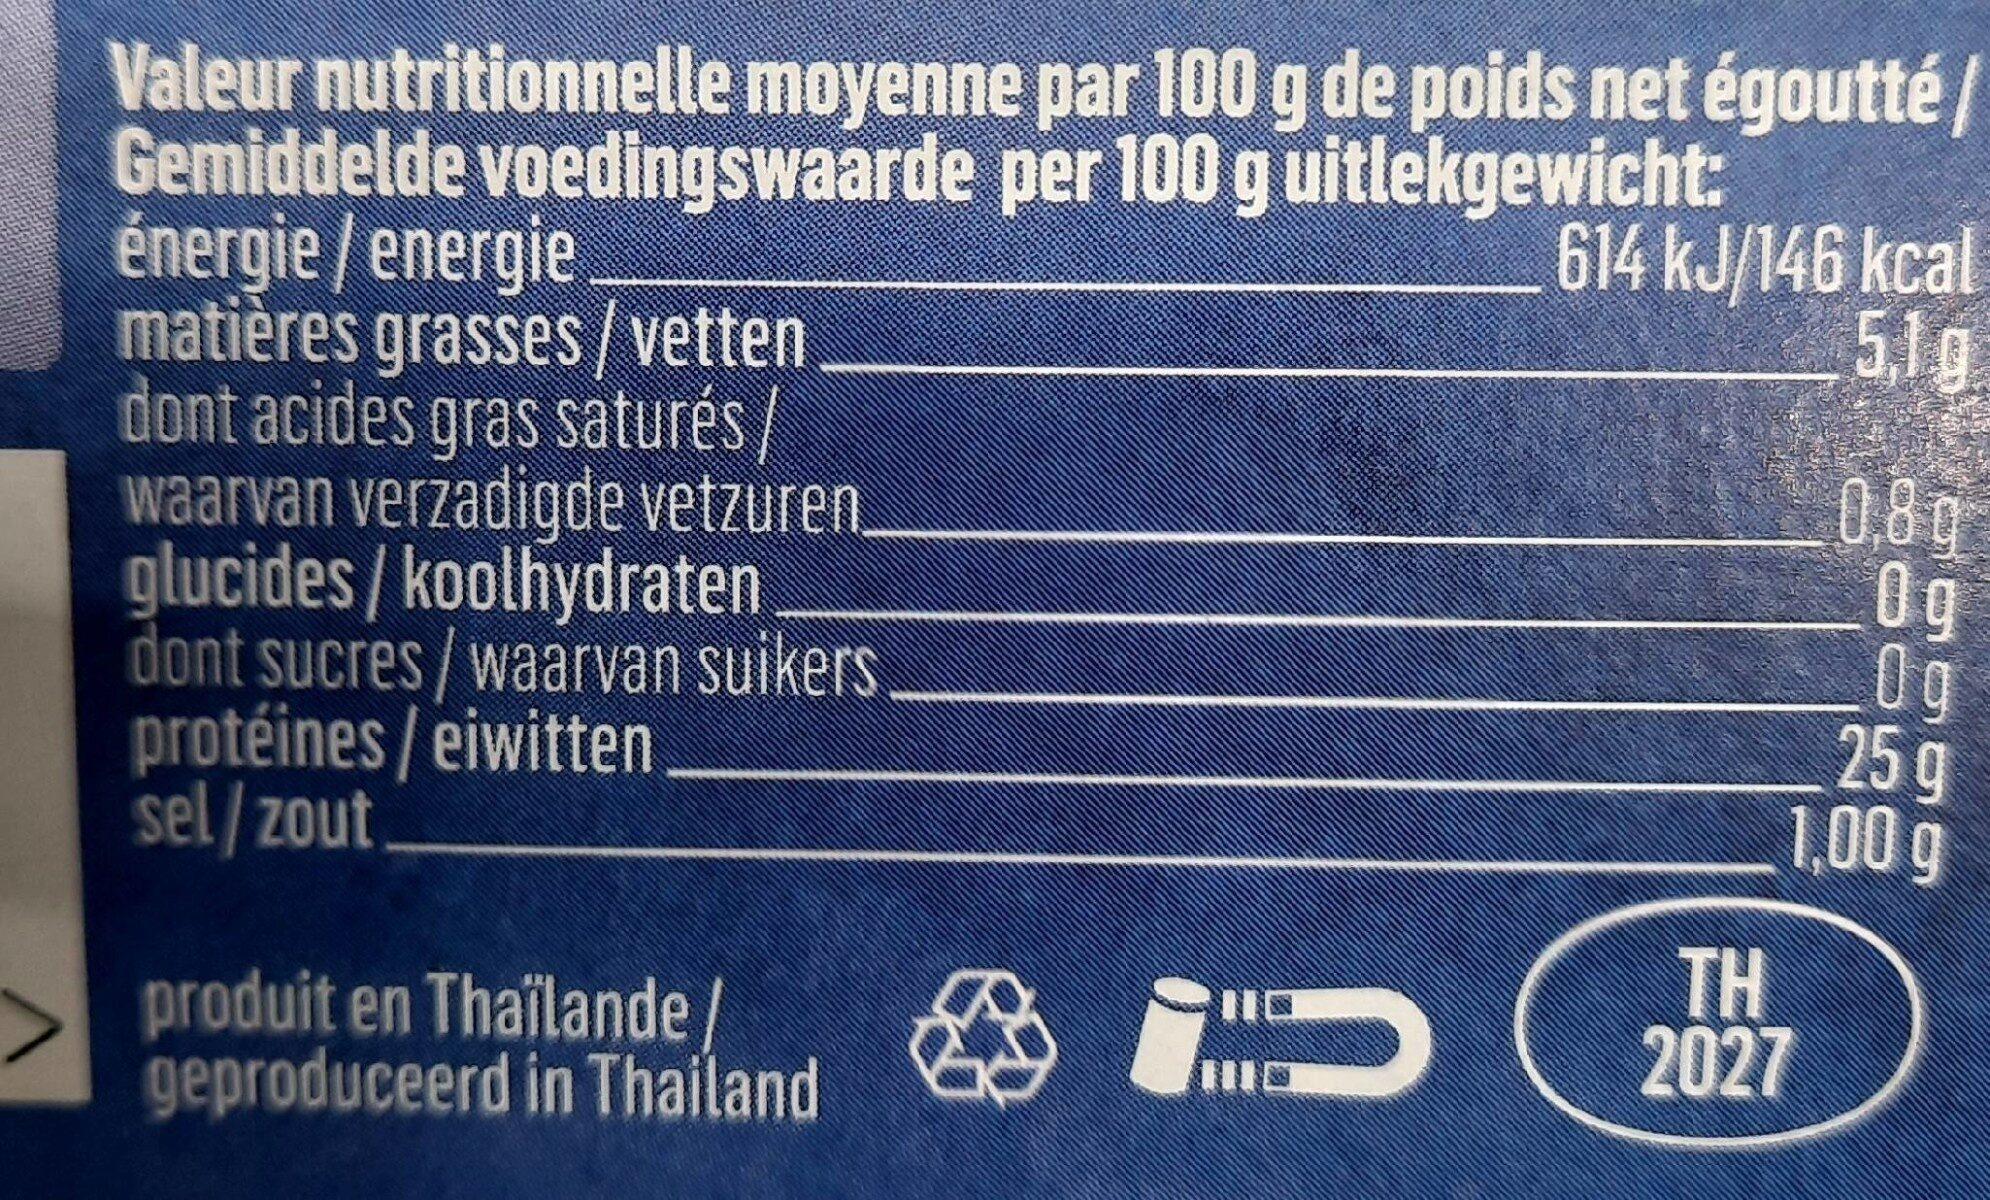 Thon huile d'olive - Informations nutritionnelles - fr